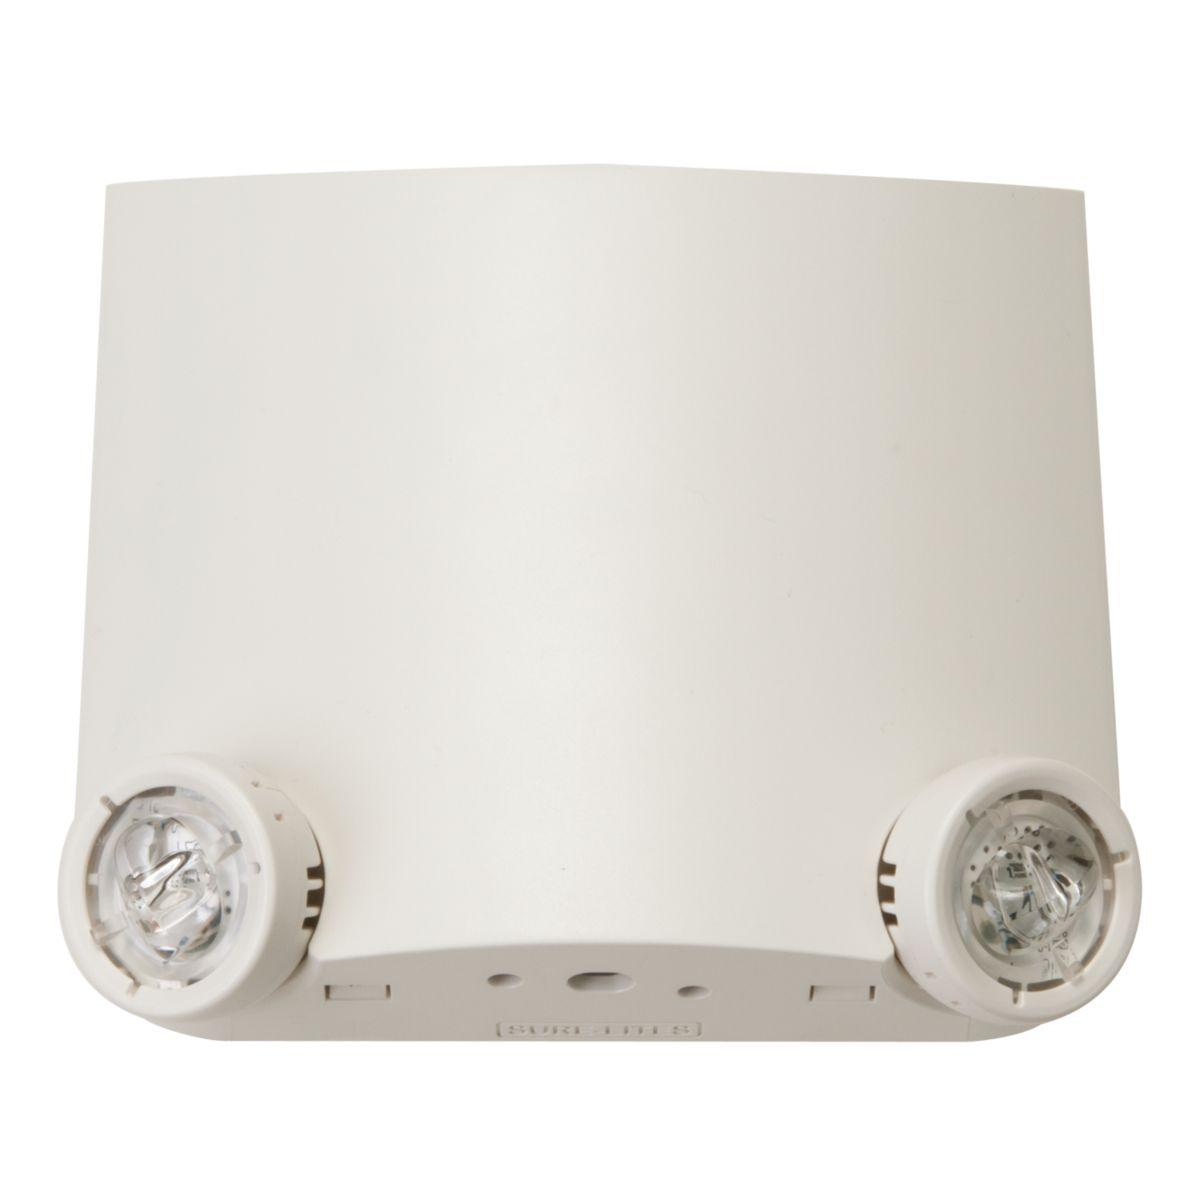 PathLinx Emergency Light